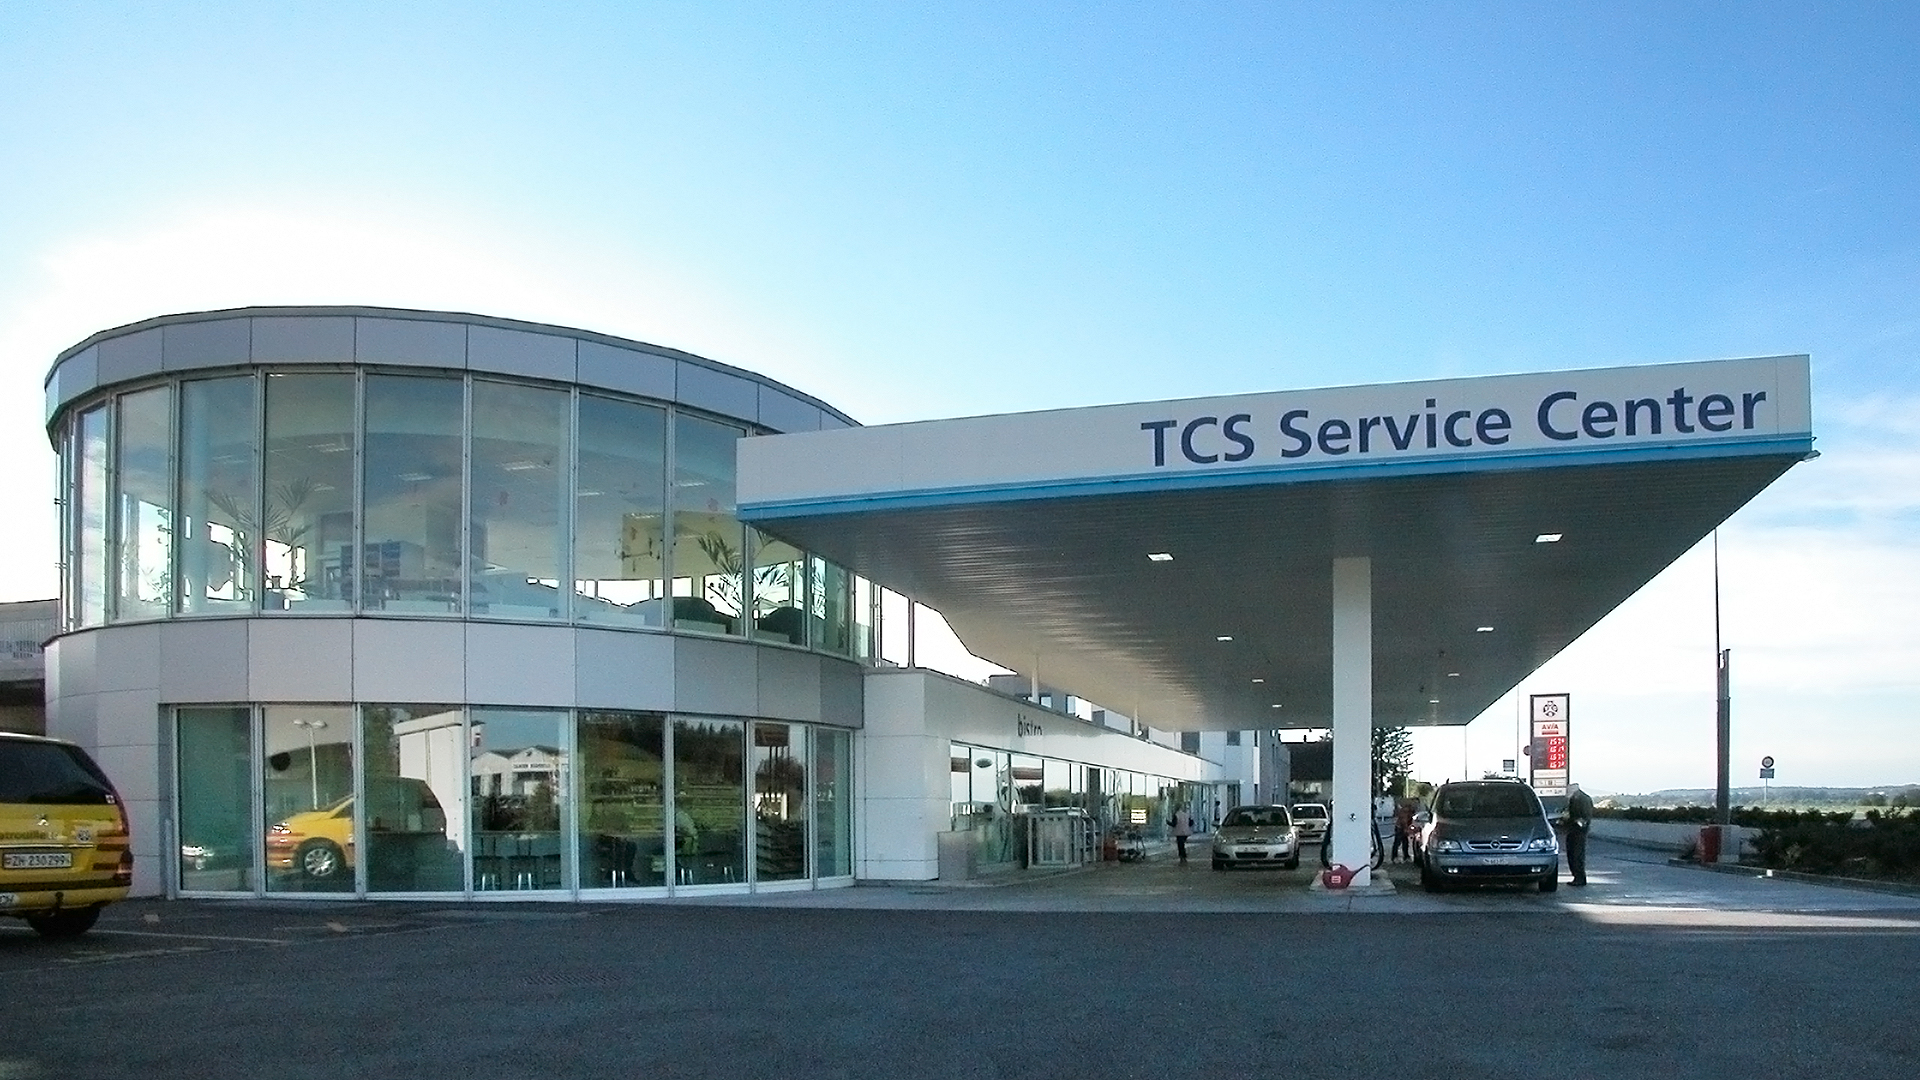 004_TCS_Volketswil